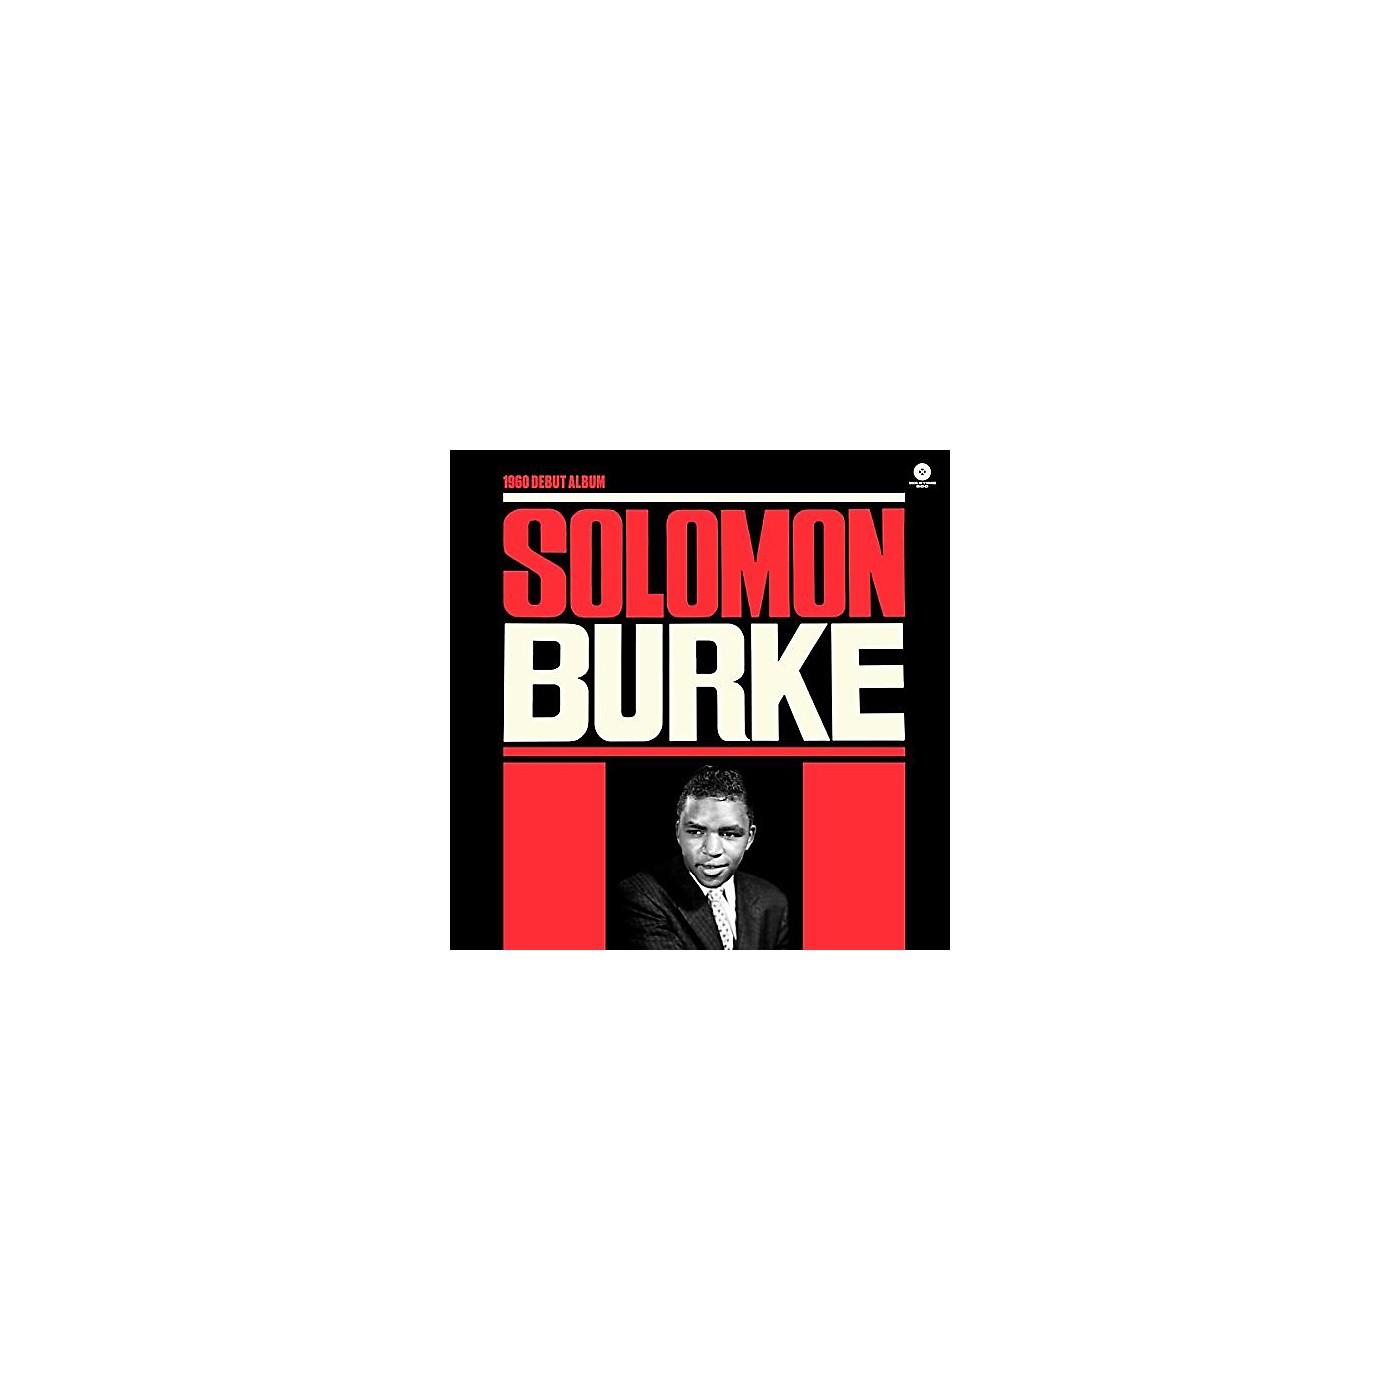 Alliance Solomon Burke - Solomon Burke (1960 Debut Album) thumbnail